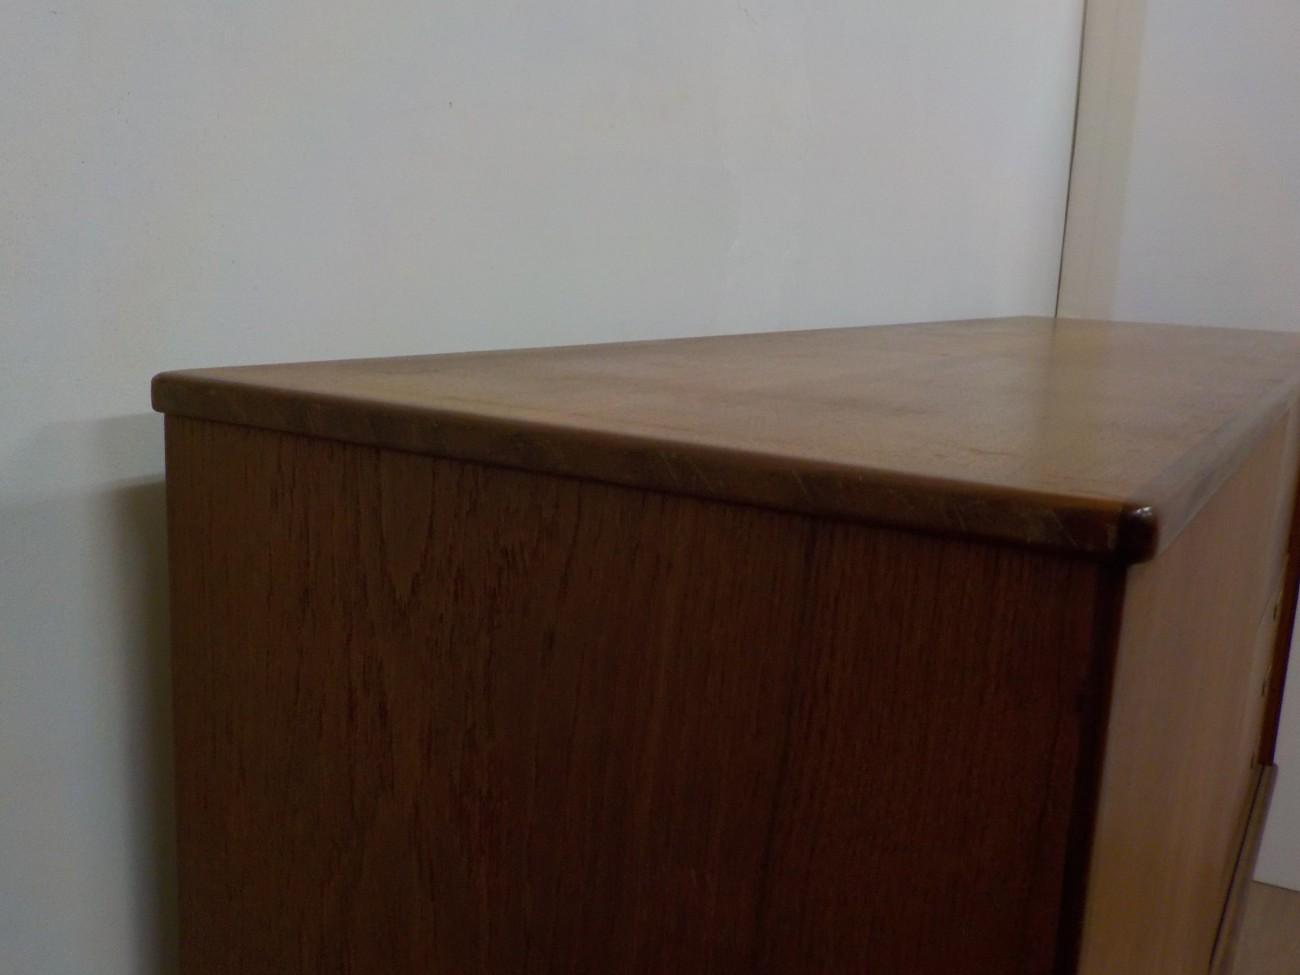 Sideboard Cabinet / チークxオーク サイドボード キャビネット / stock2012-16